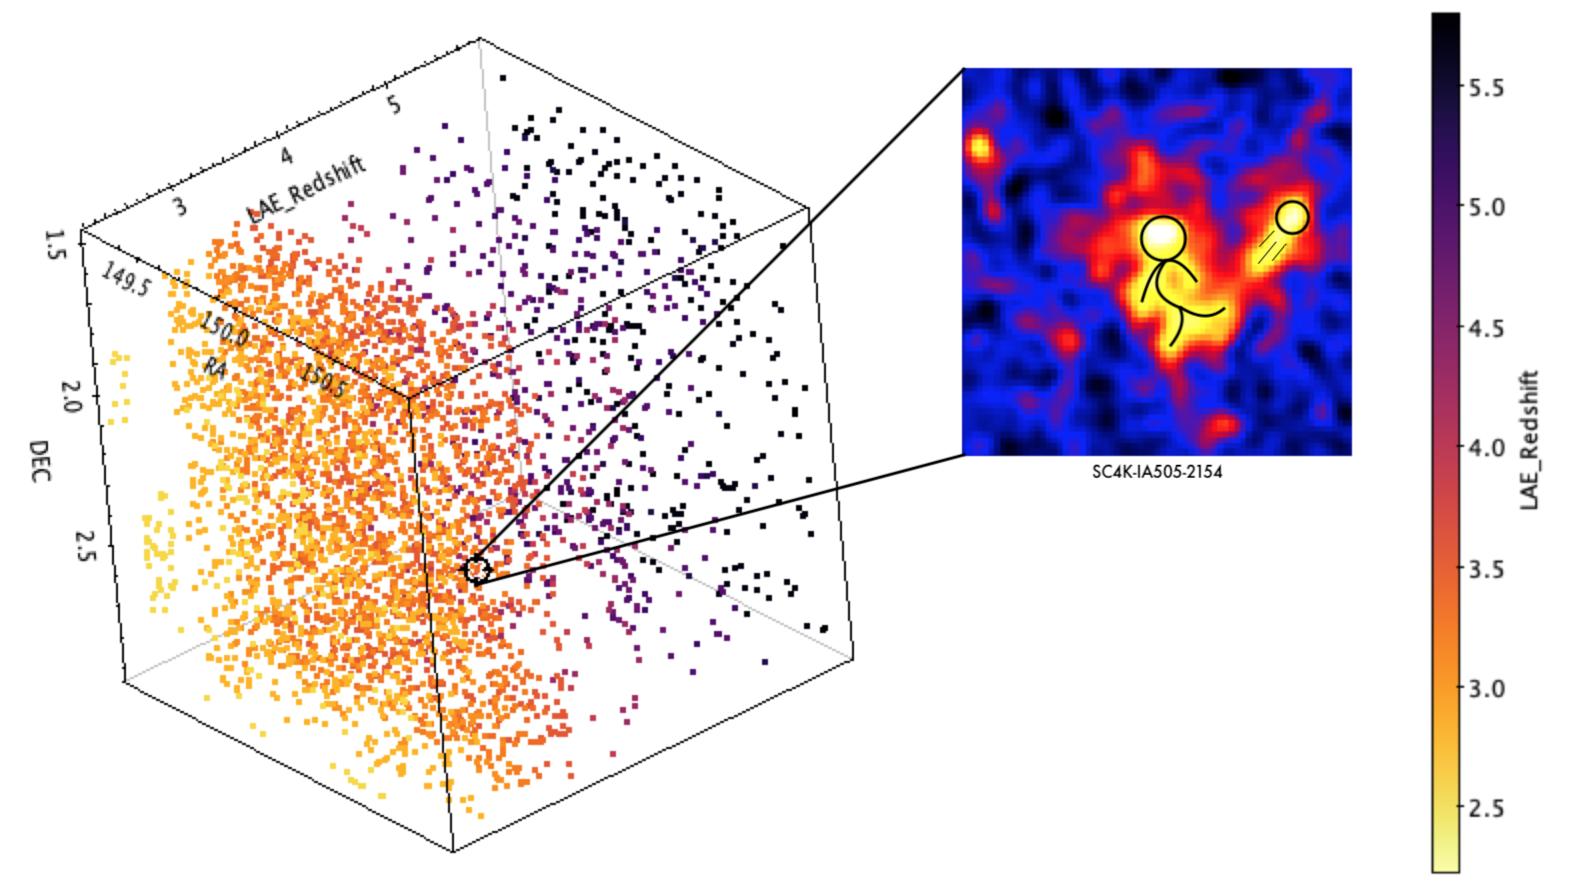 3Dcatalogue(SC4K-IA505-2154)